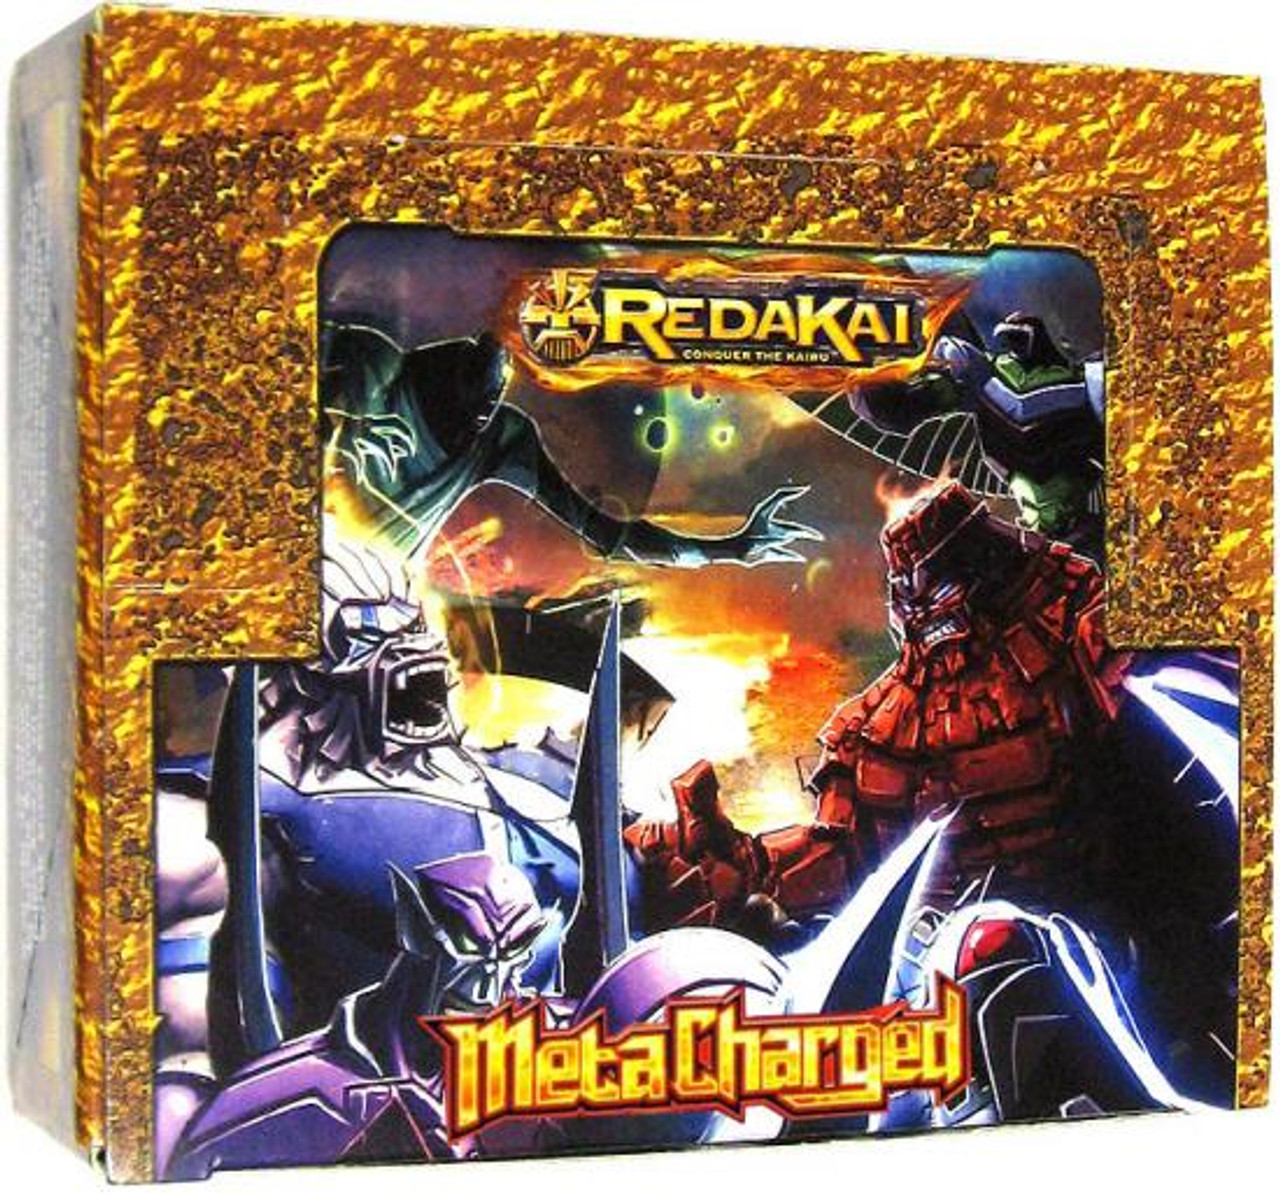 Redakai Conquer the Kairu MetaCharged Gold Booster Box [Hobby Edition]